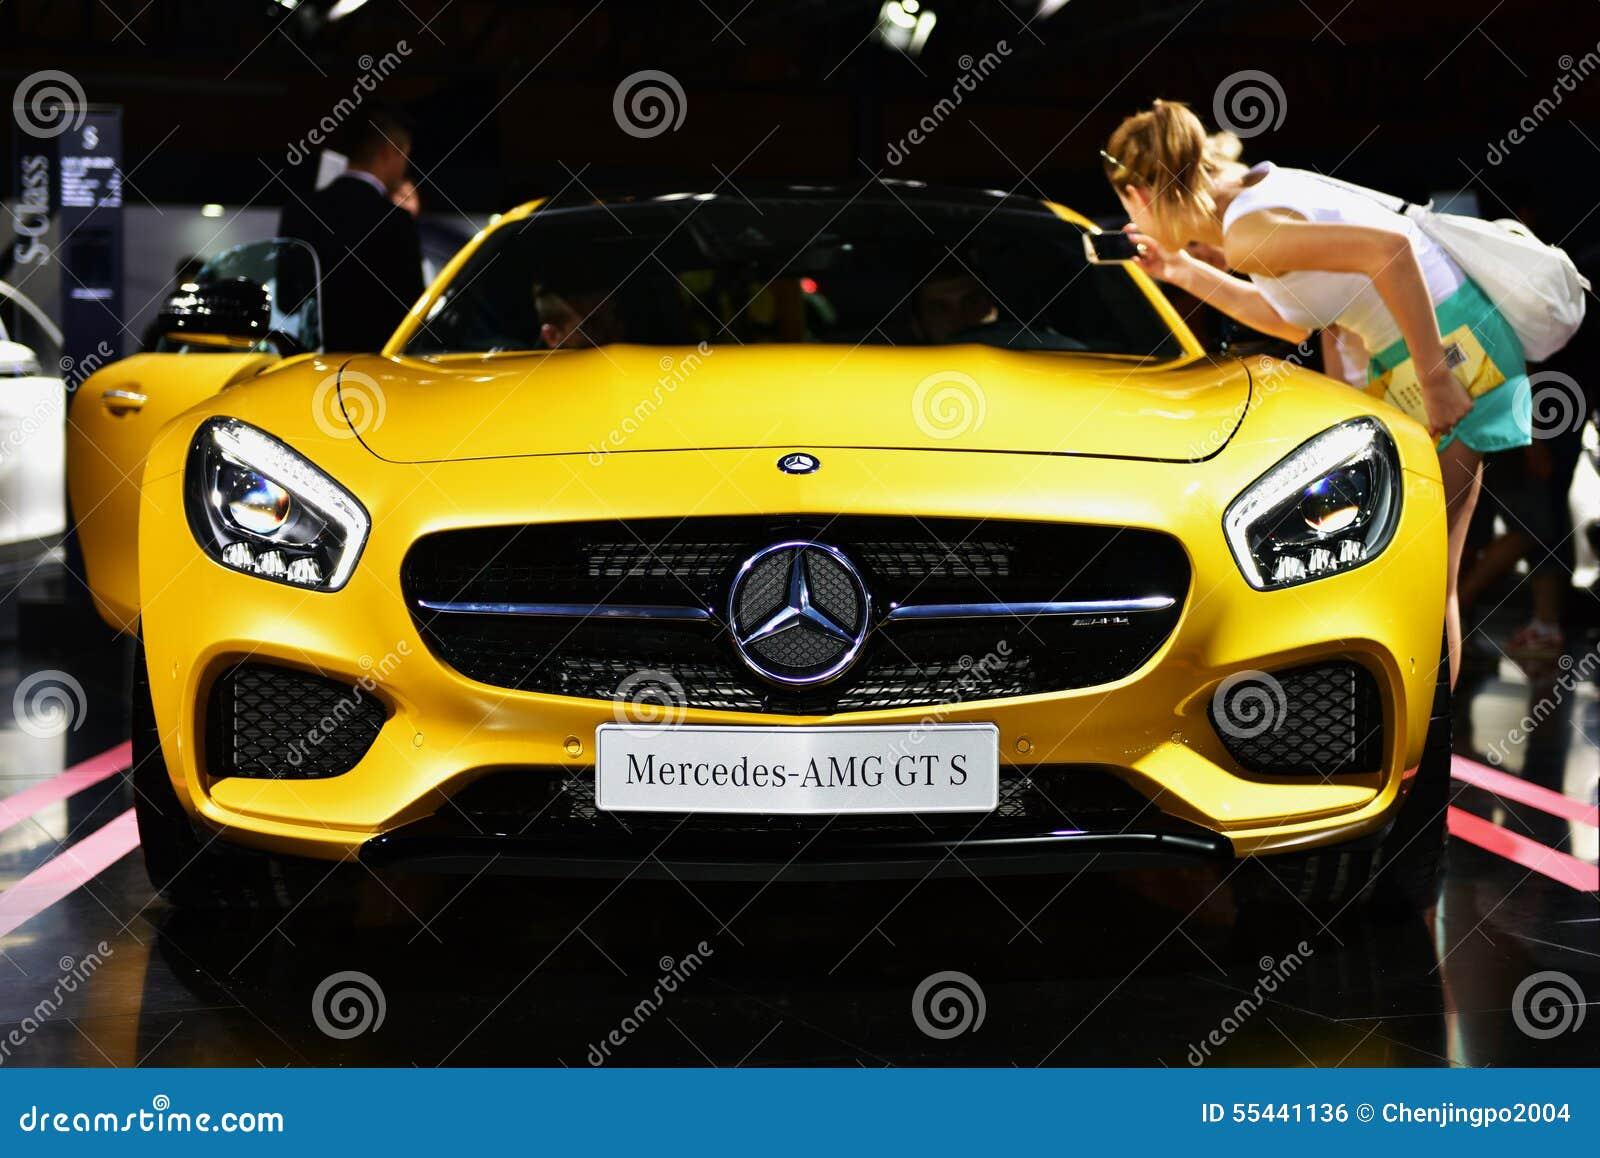 Mercedes Benz AMG GT S